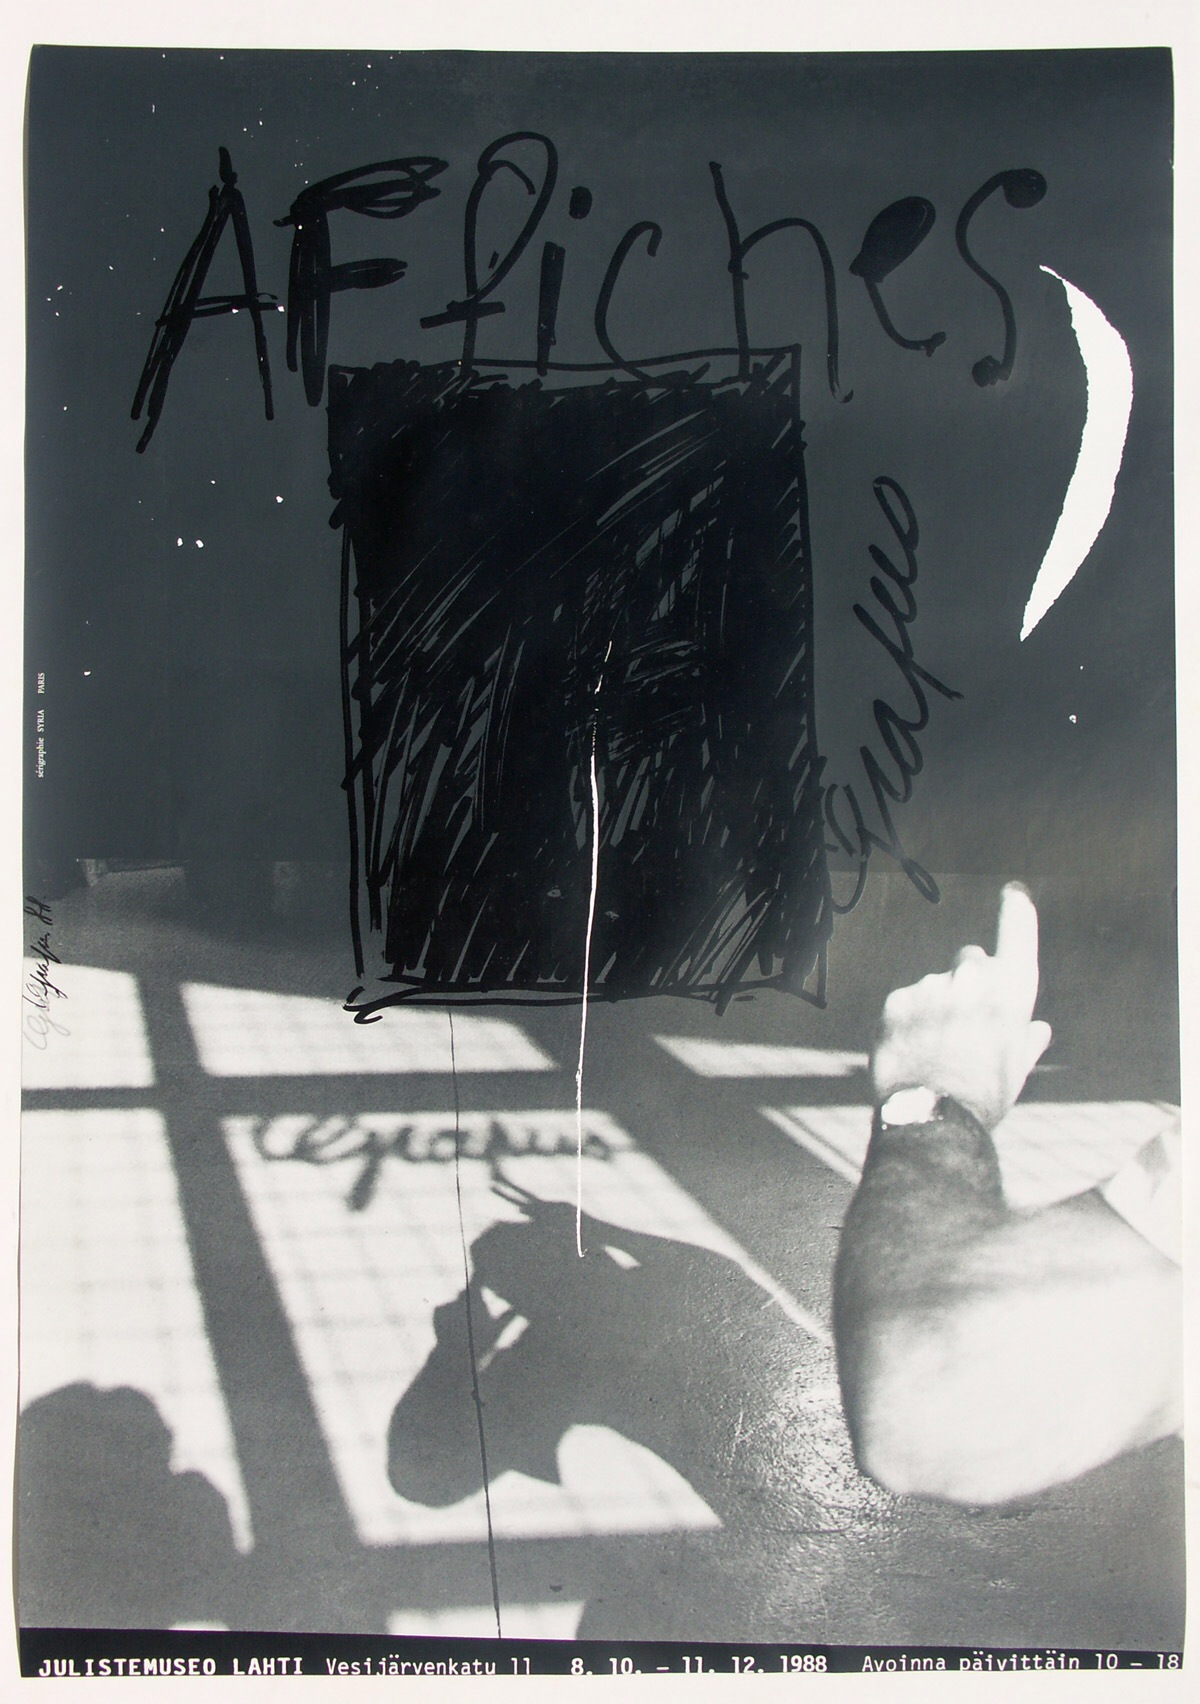 Artist: Grapus